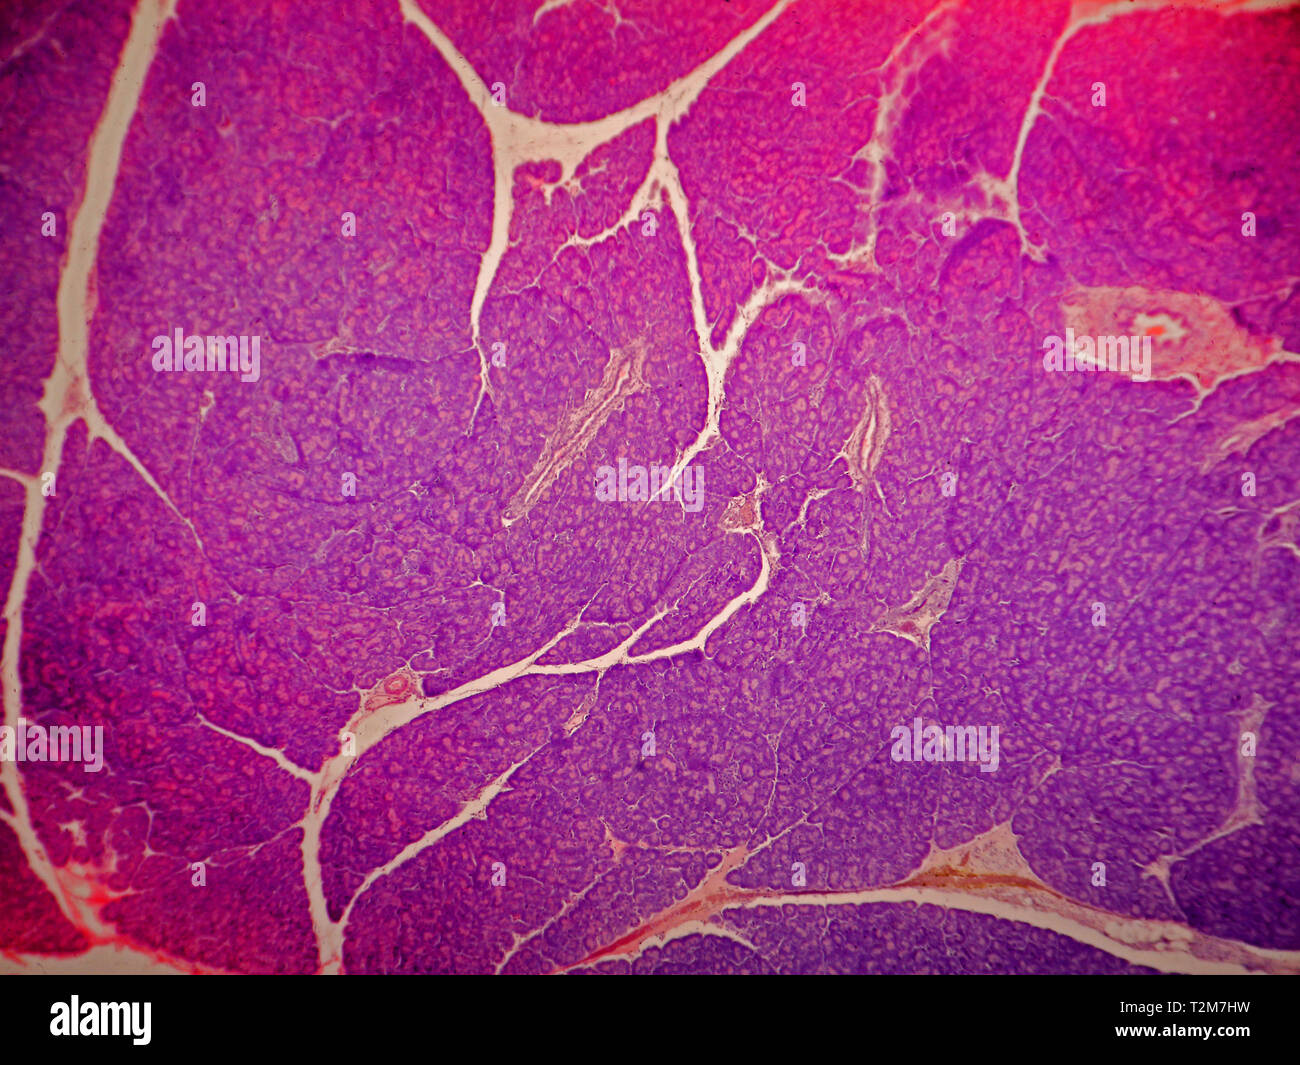 Pancreas tissue. - Stock Image